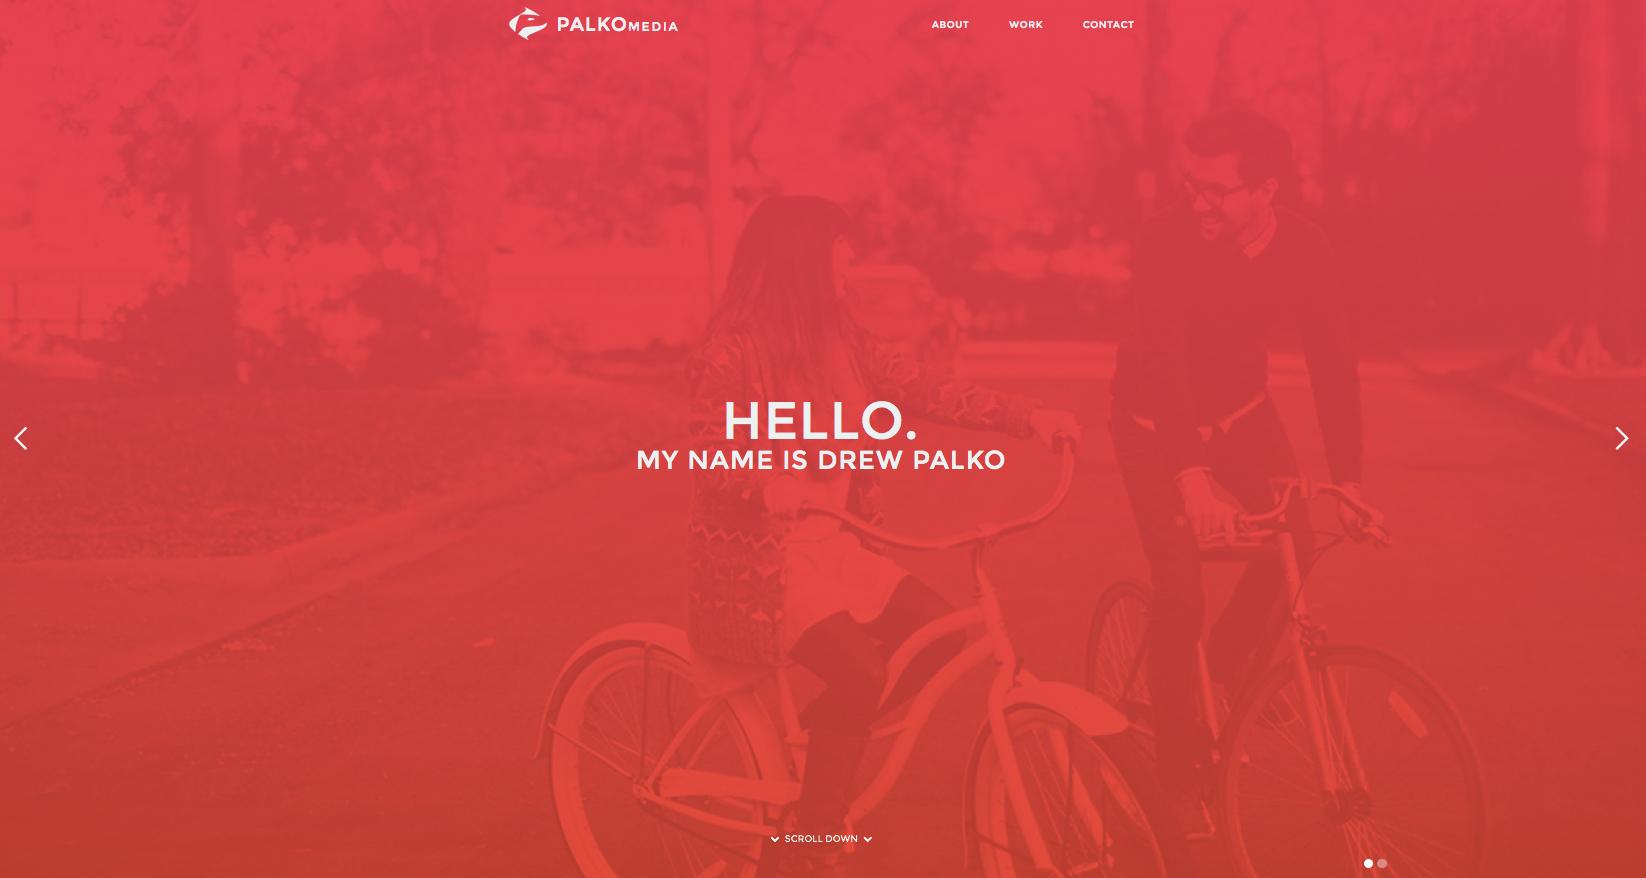 Drew Palko's website